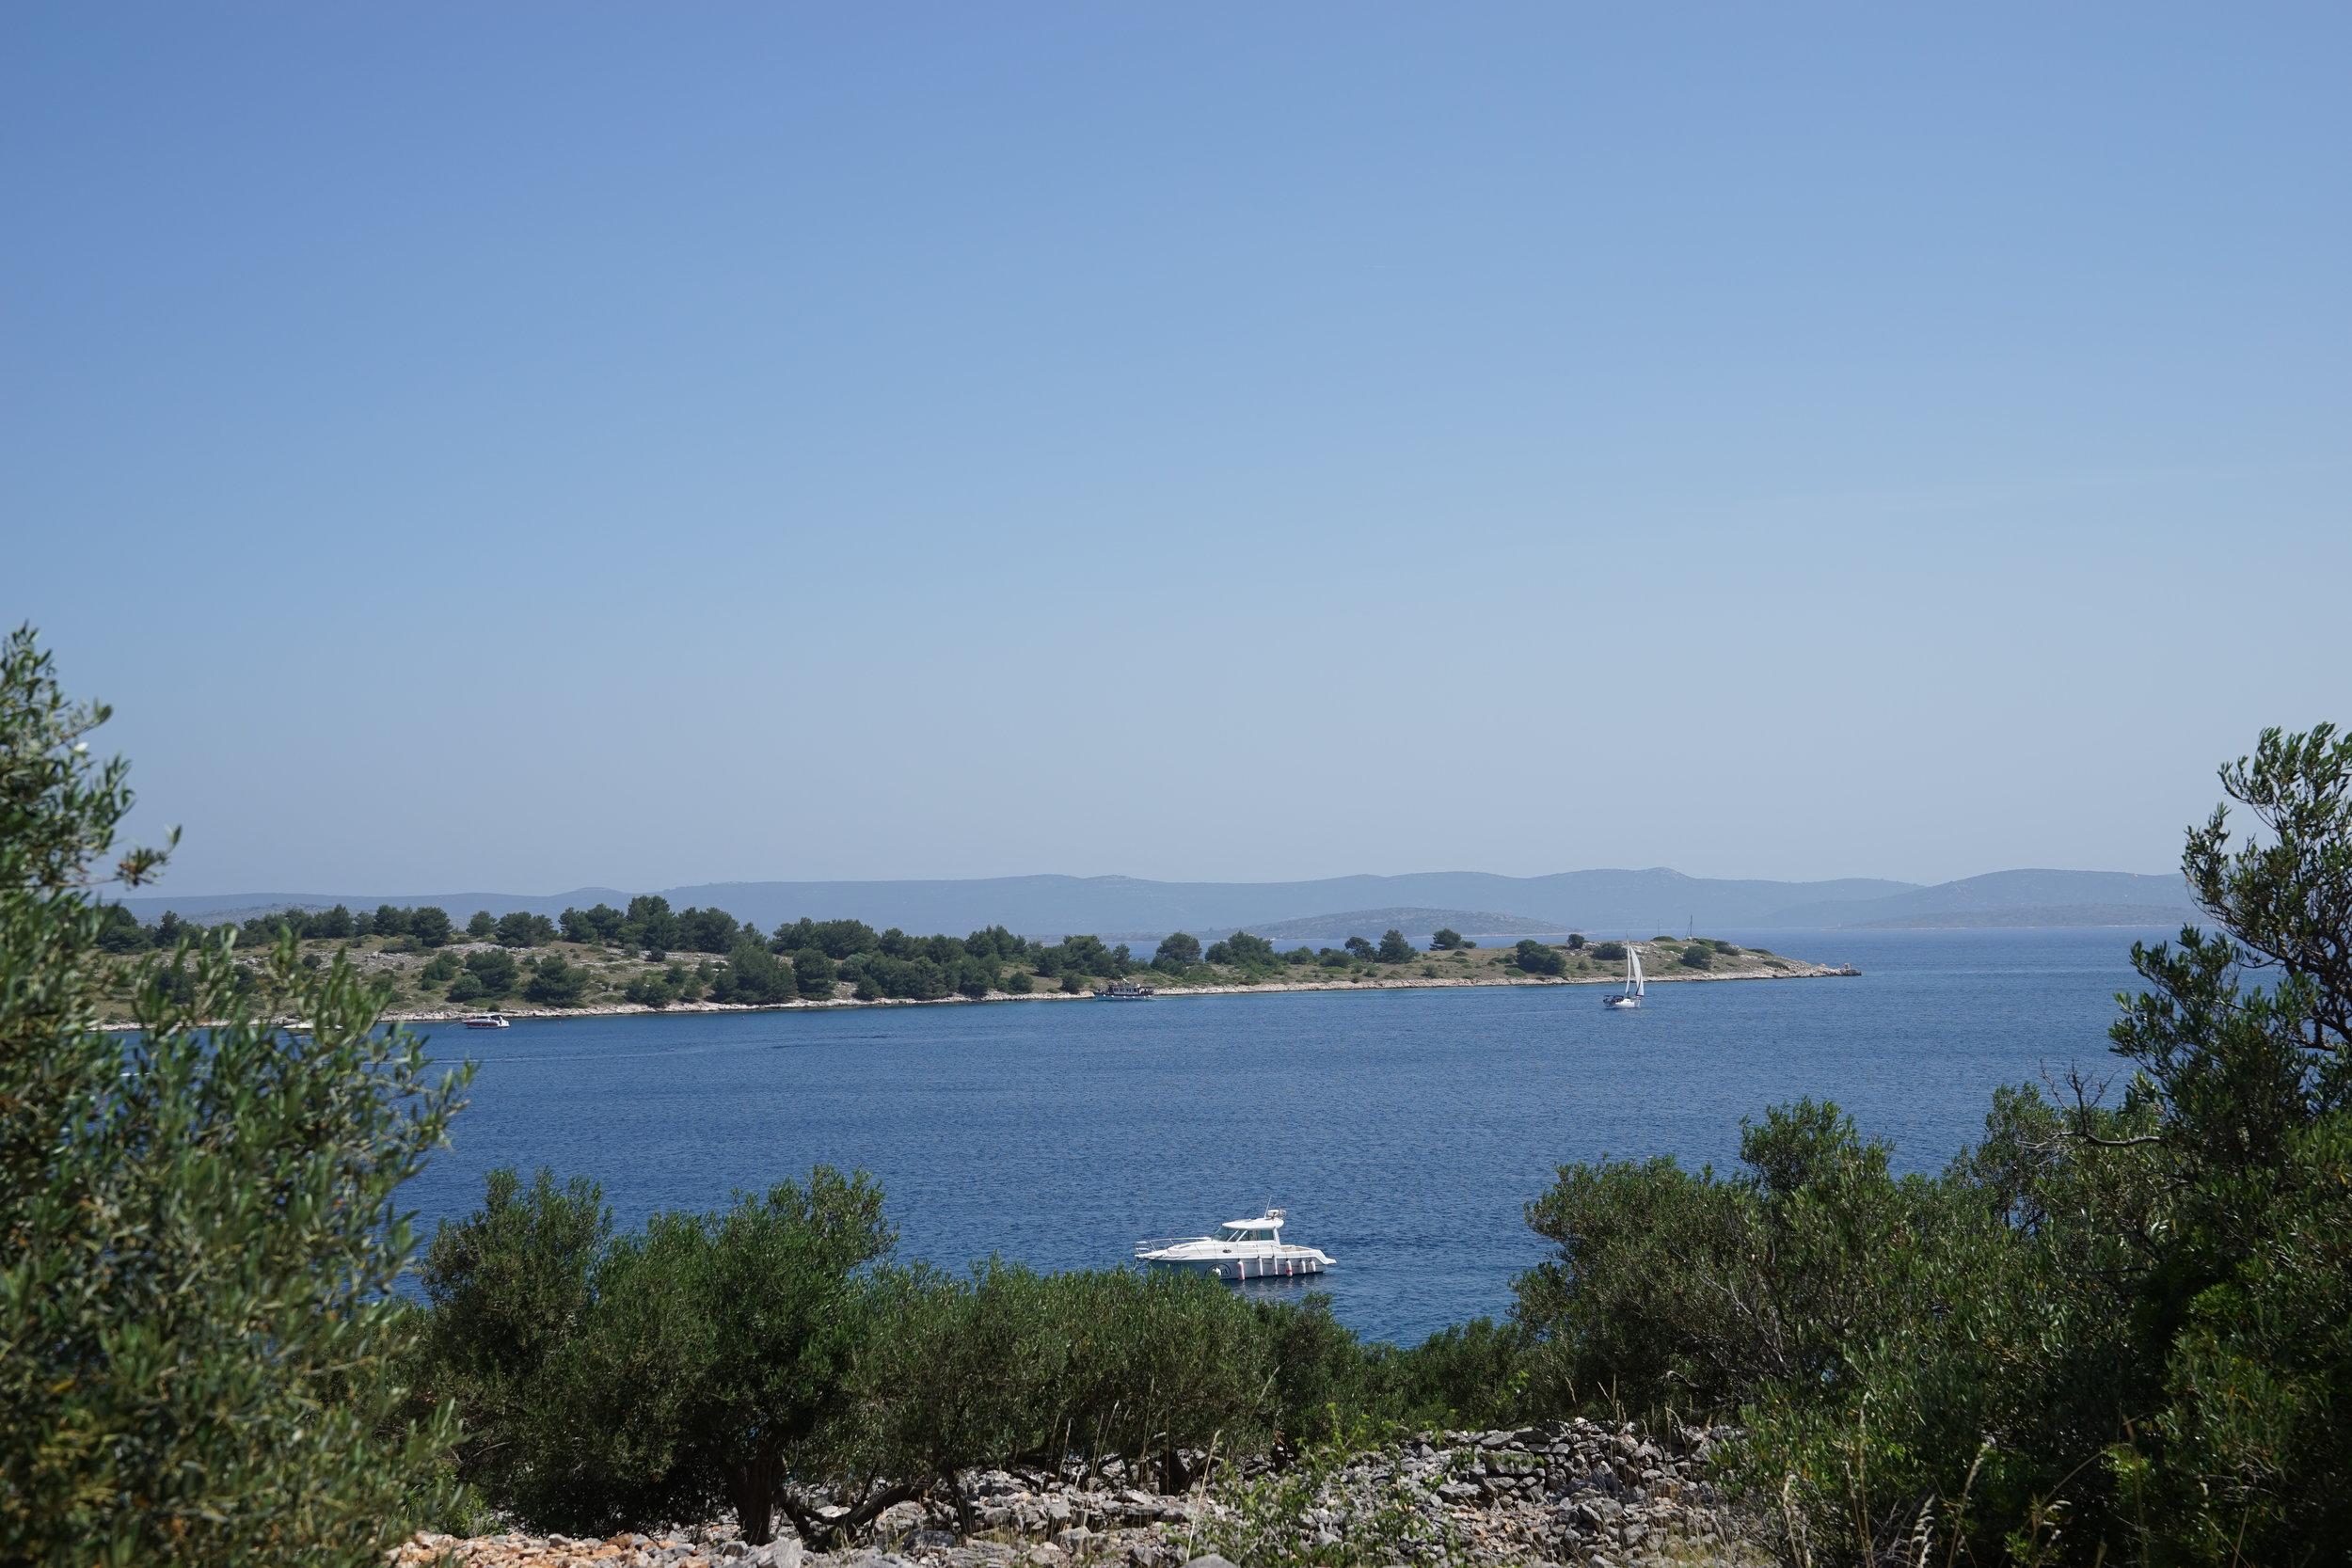 Island of Zut, Croatia - Fortune